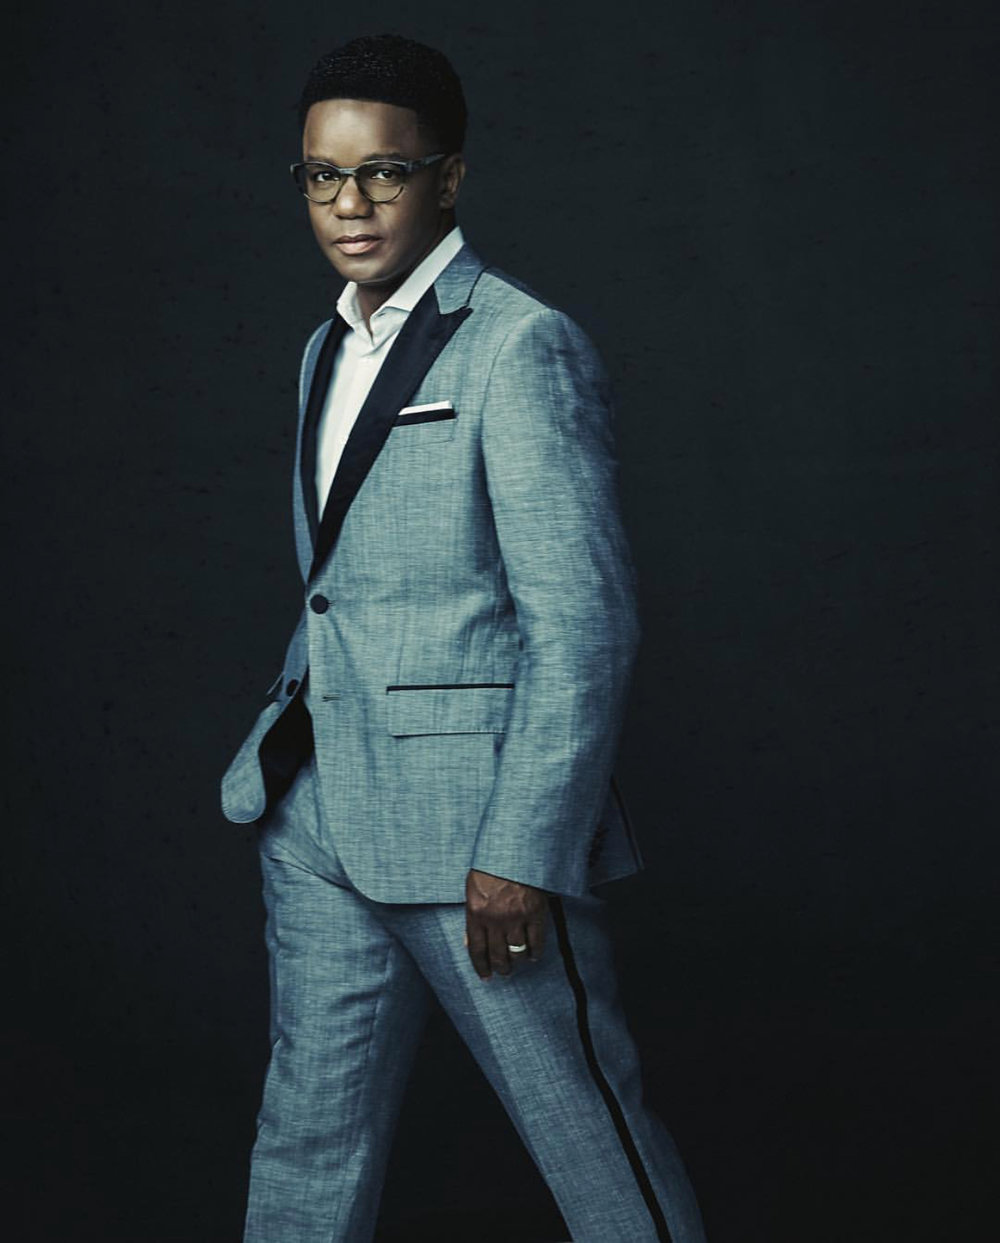 Stefon Harris - Dean of Jazz Studies; Manhattan School of Music - Blackout - Thought Leader